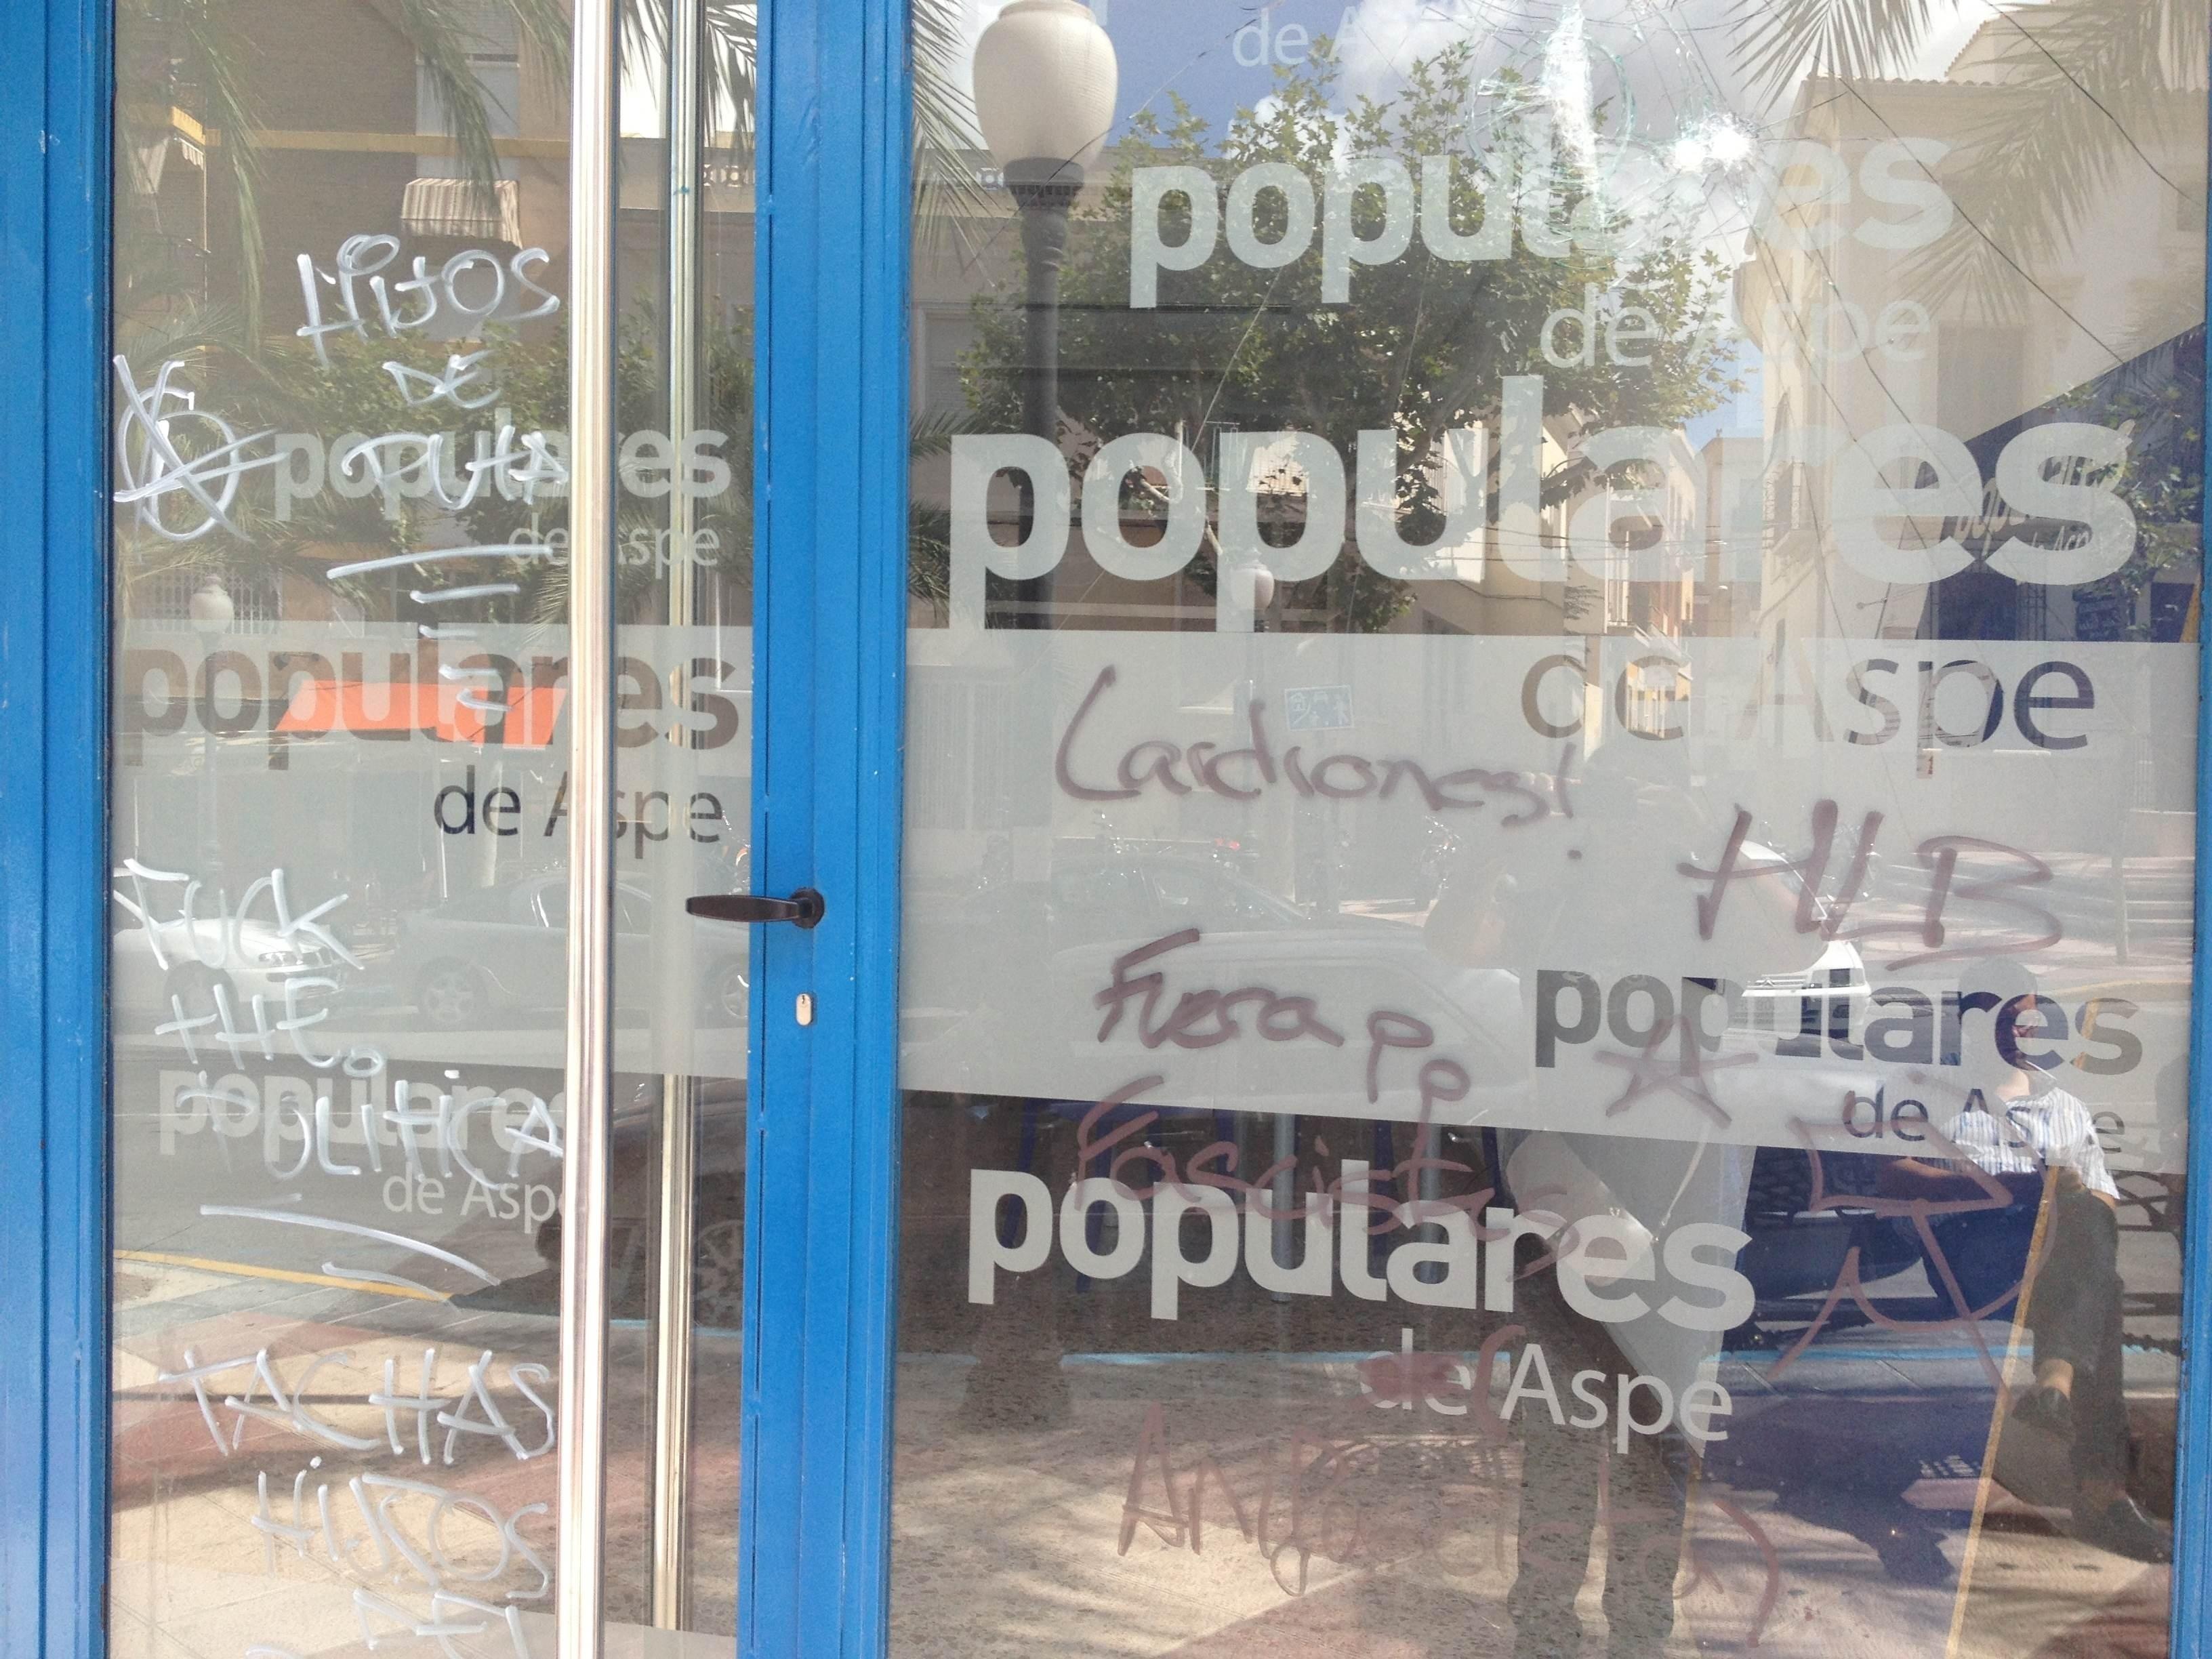 El PP de Aspe denuncia ante la Guardia Civil ataques vandálicos a su sede